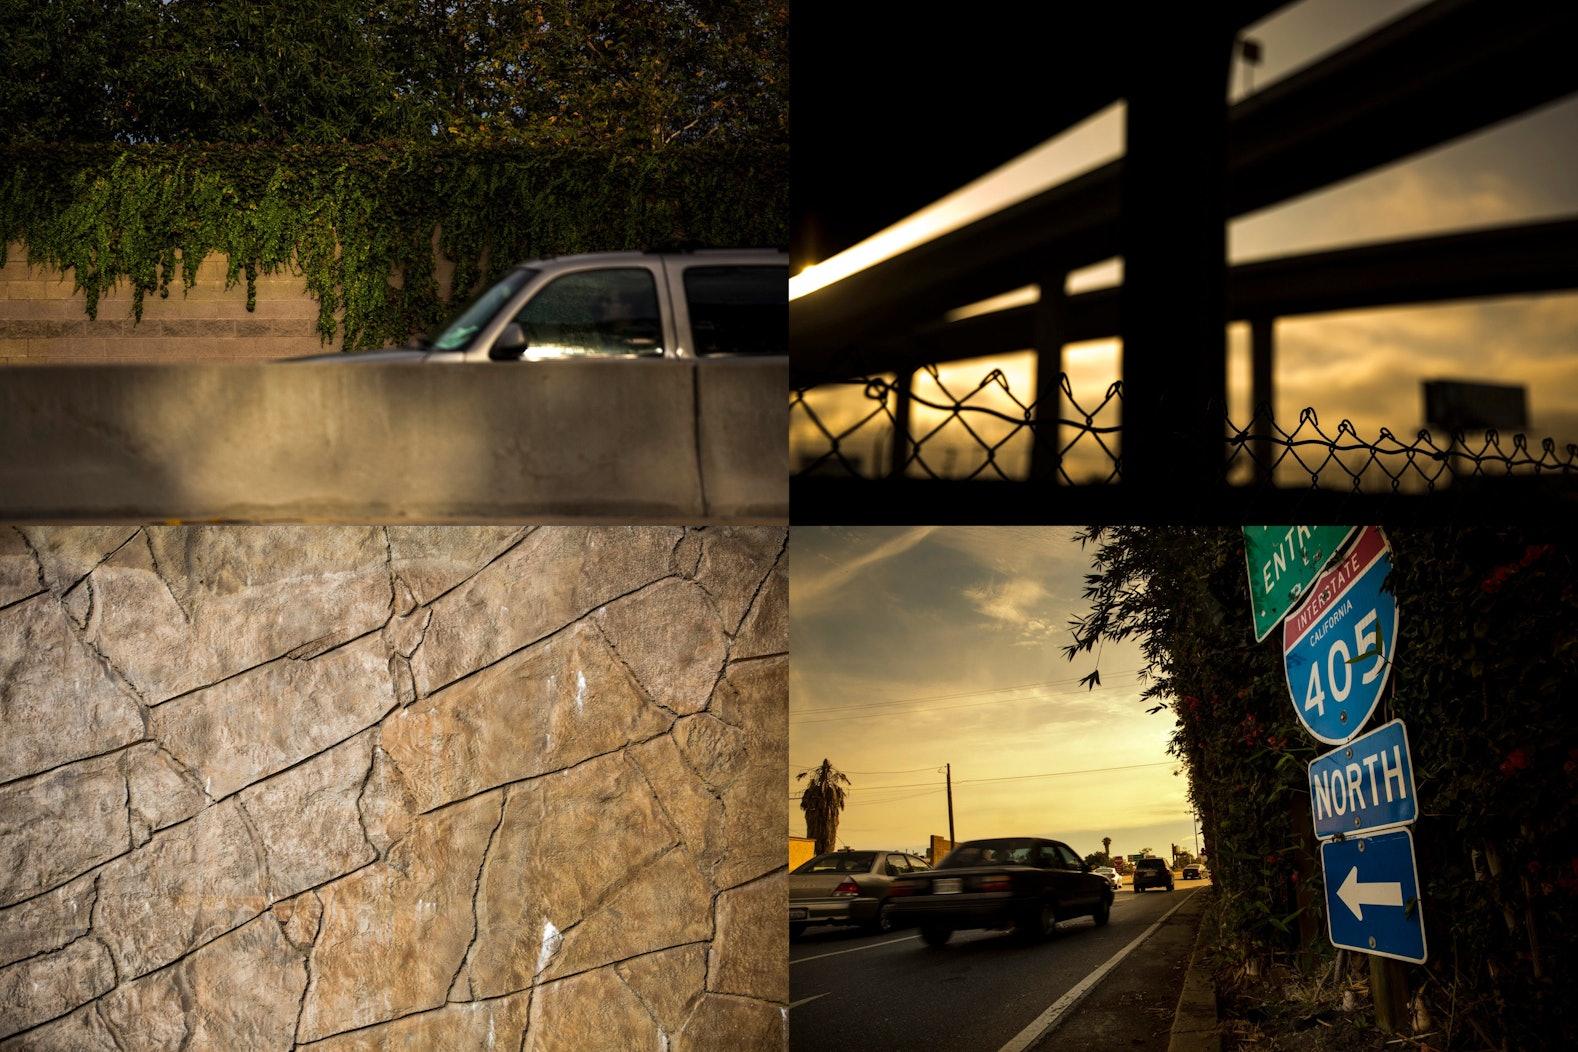 North + South : Kent Nishimura : Los Angeles, CA